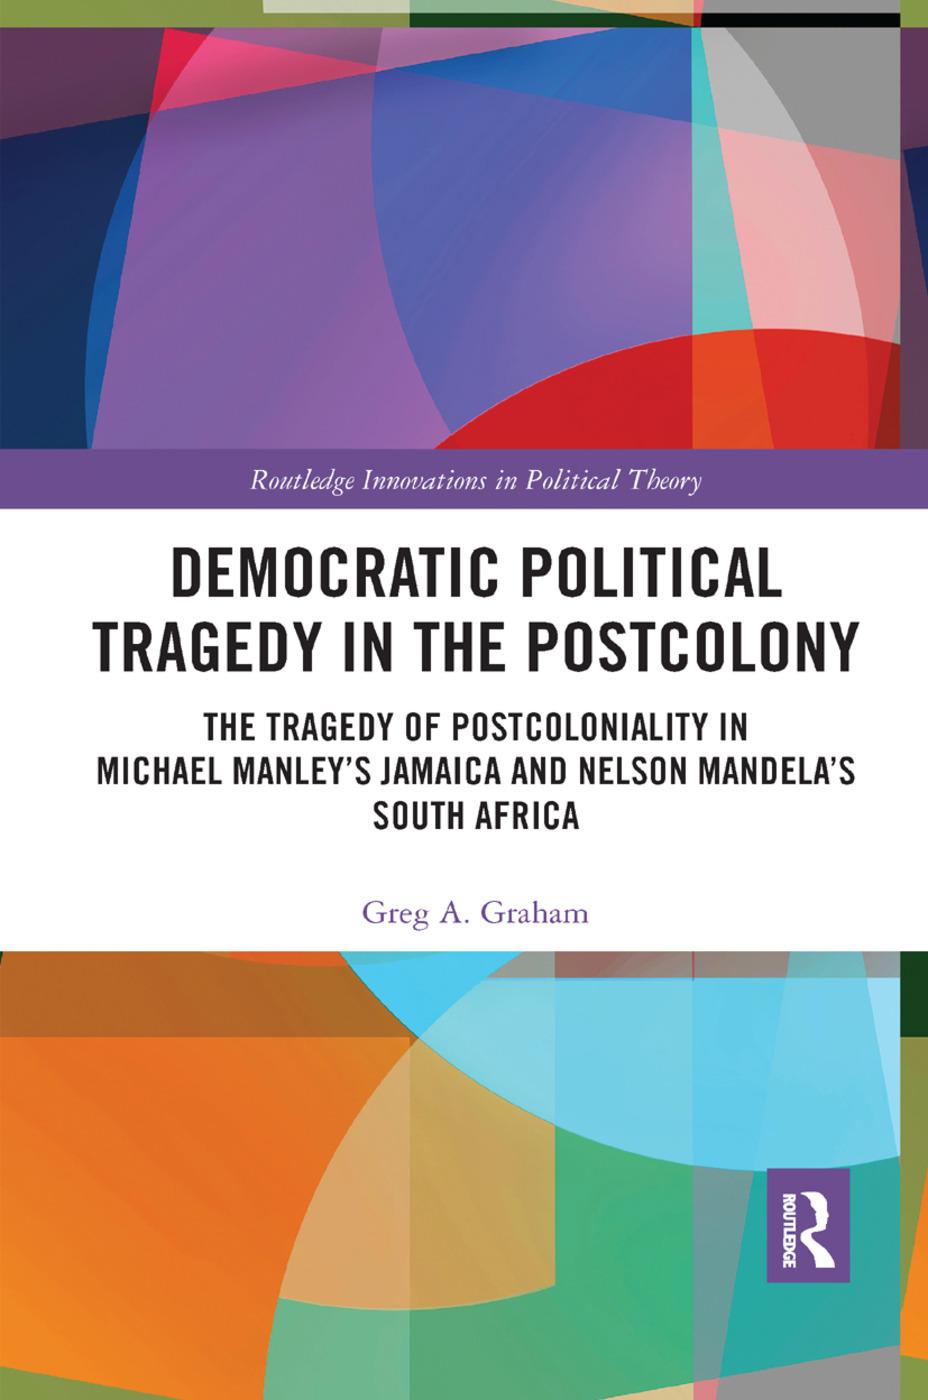 Democratic Political Tragedy in the Postcolony